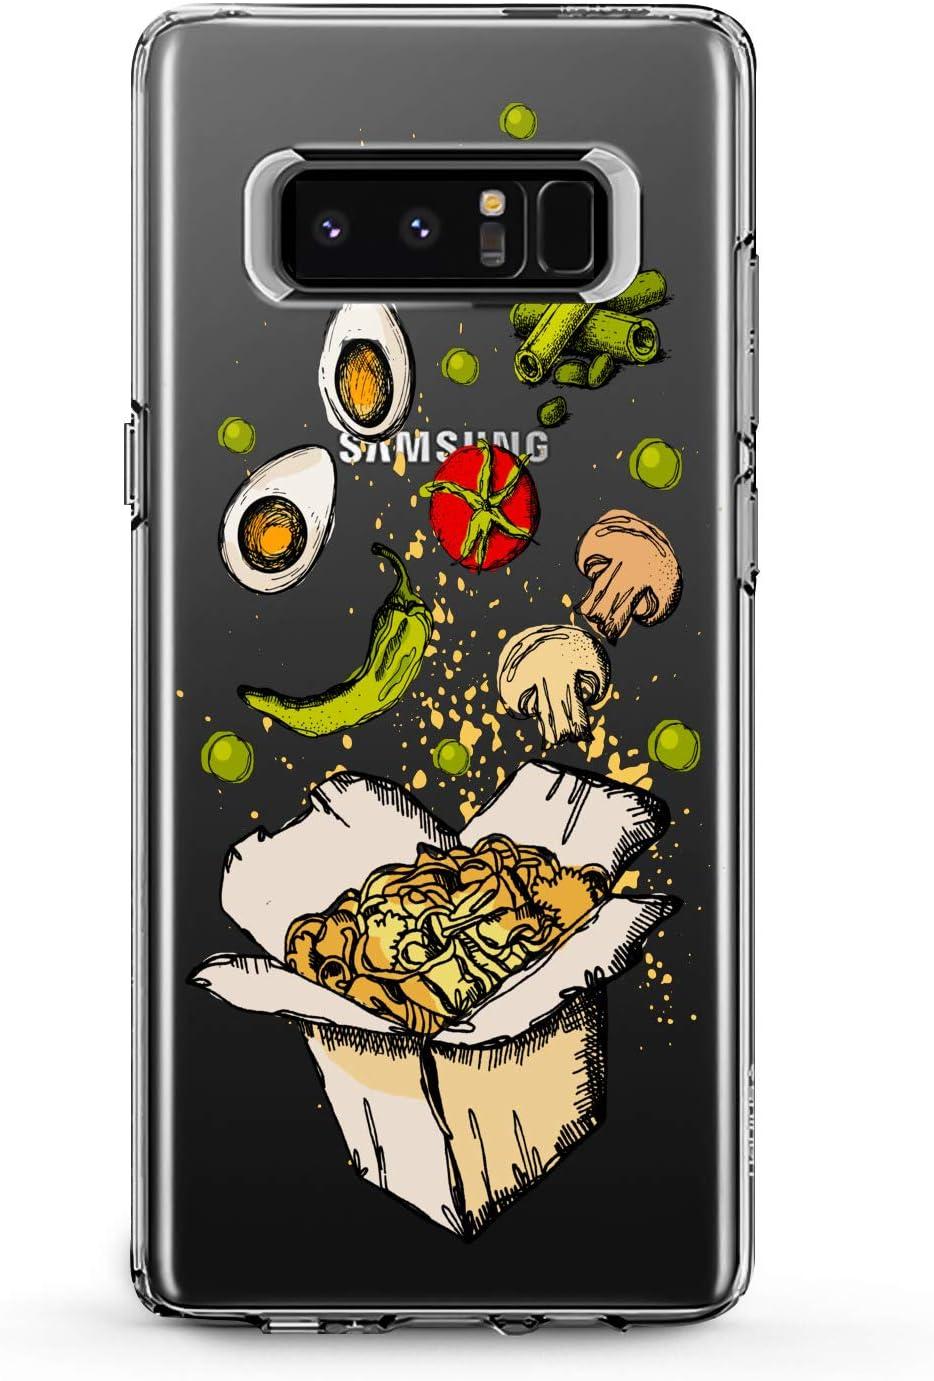 Anreda TPU Case Compatible with Samsung Galaxy J8 J7 Prime J6 Plus J5 J4 Core J2 Beans Smooth Food Print Slim fit Flexible Lunchbox Desig Lady Pasta Fresh Soft Girl Eggs Cover Pepper Gift Clear Design